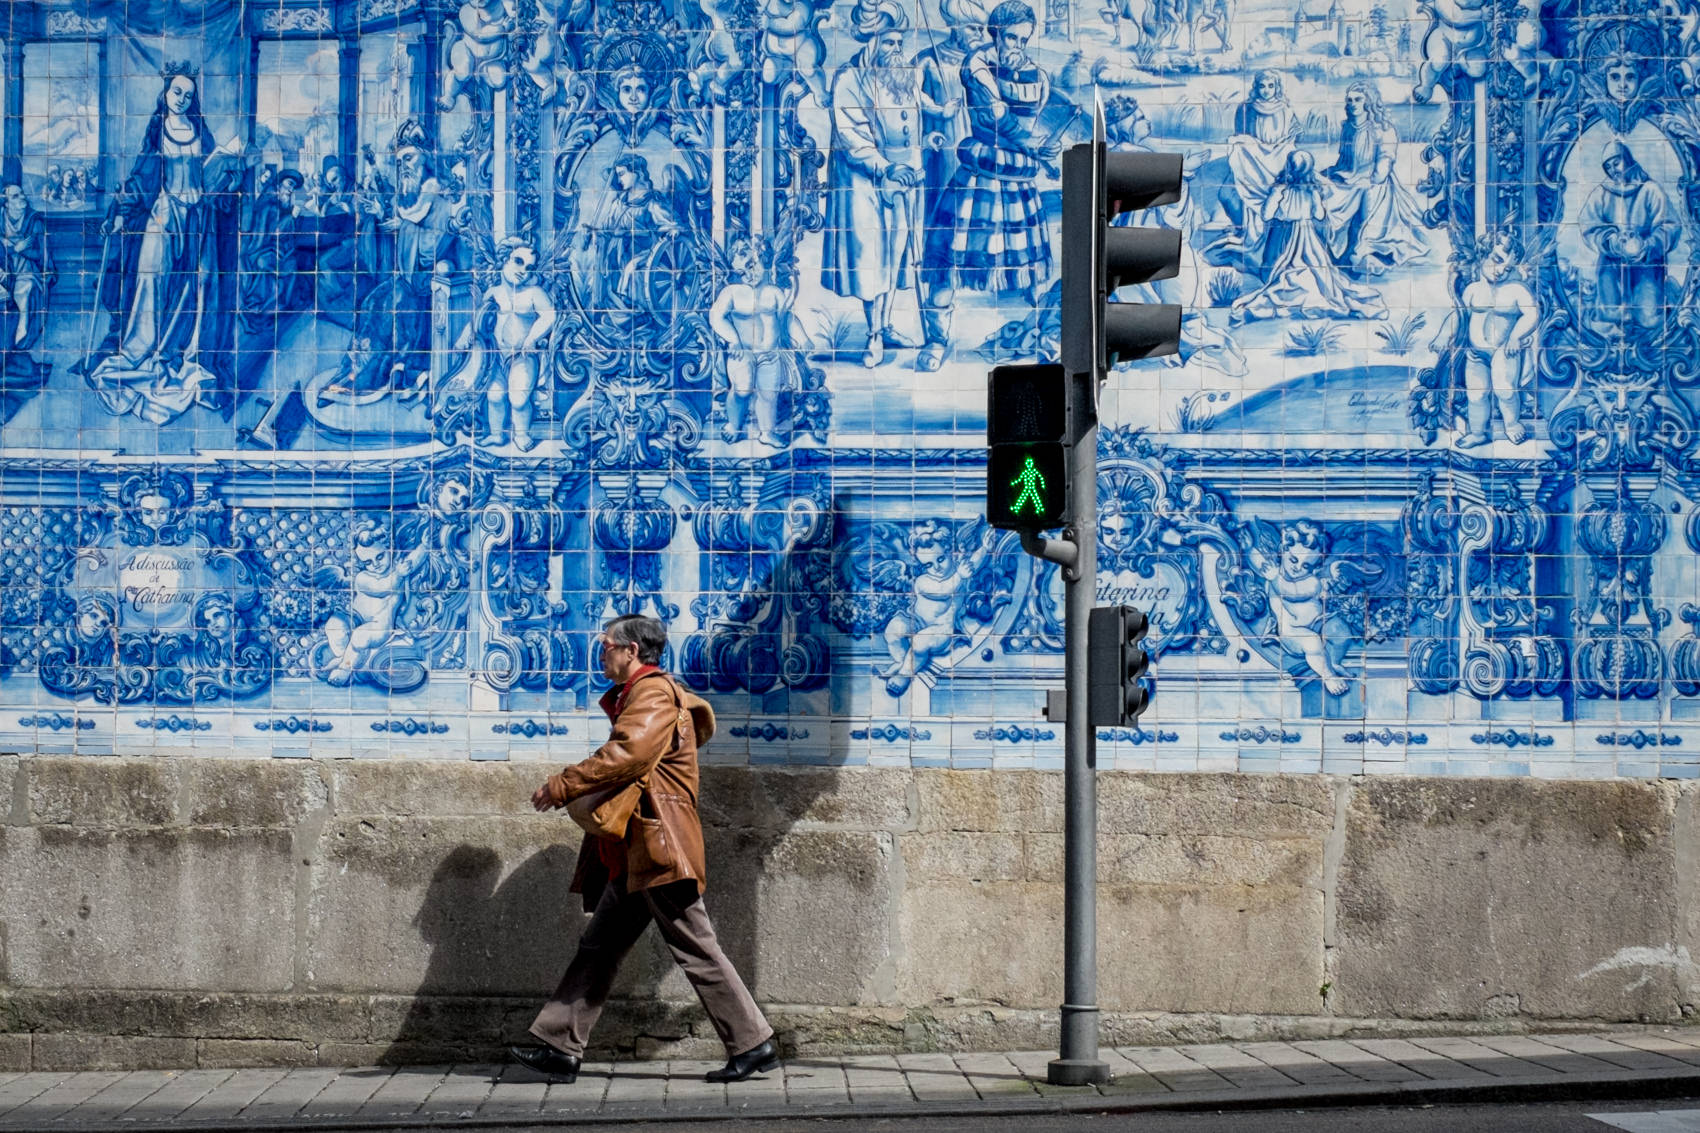 Porto Street Photography Shooting Street To Improve Your